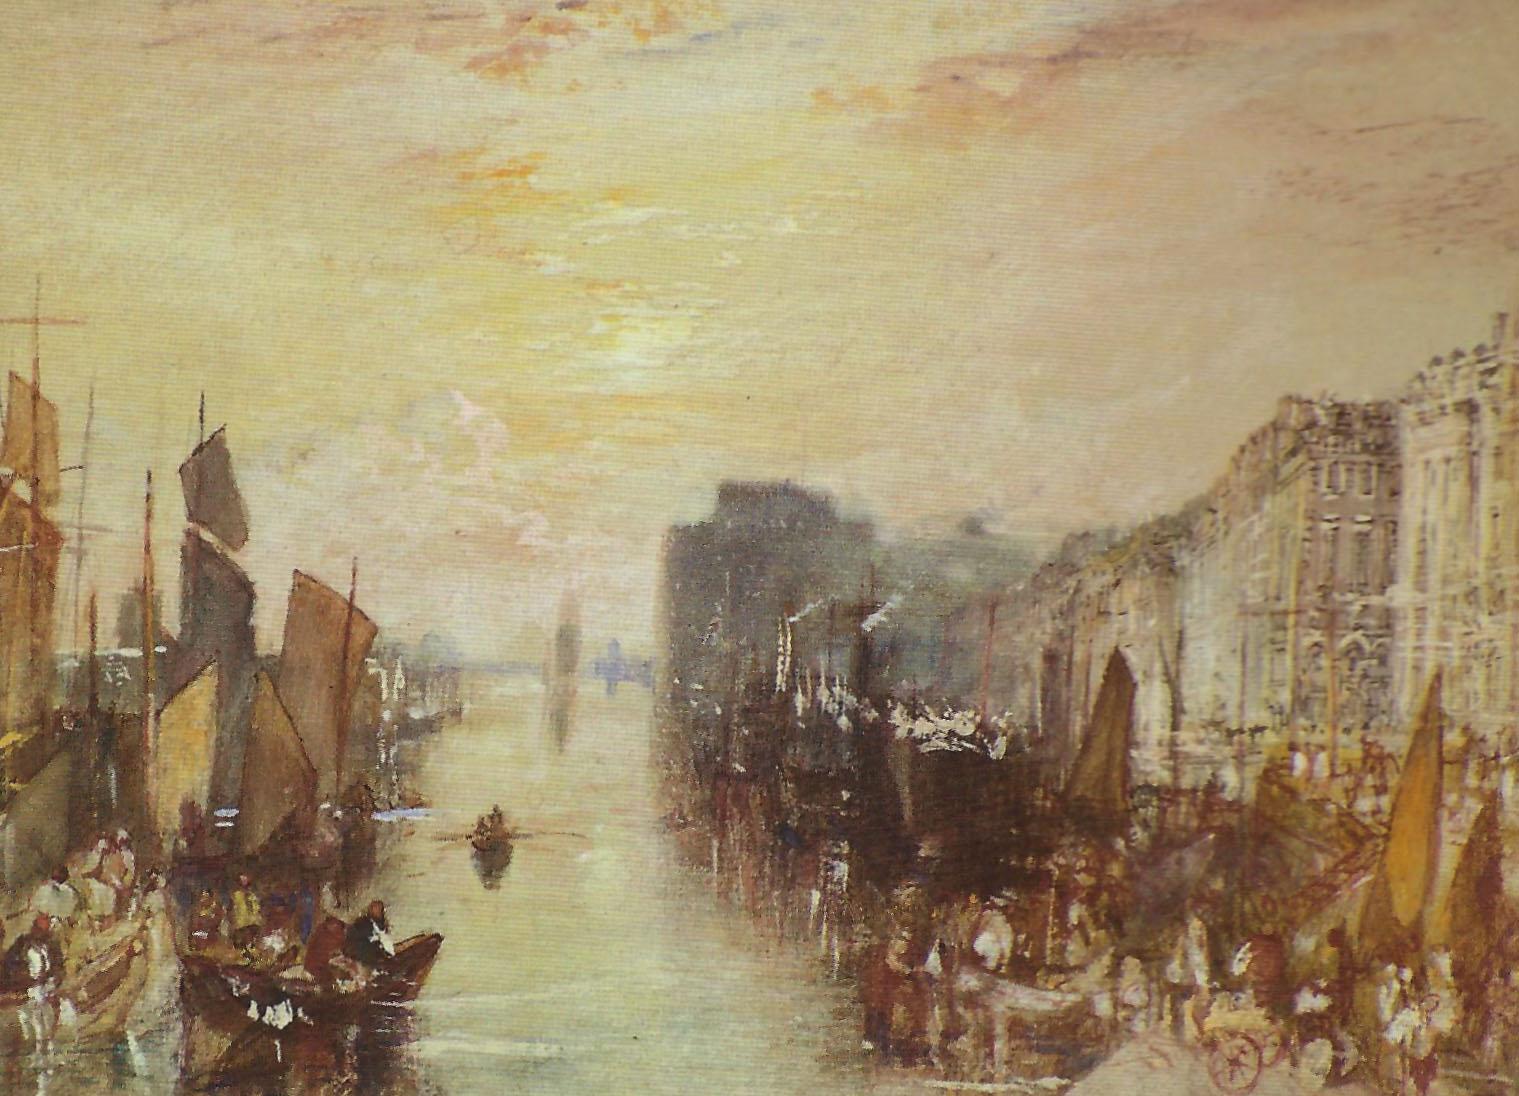 Пейзажи природы картины Уильям Тернер Гавр Альберт Сафиуллин